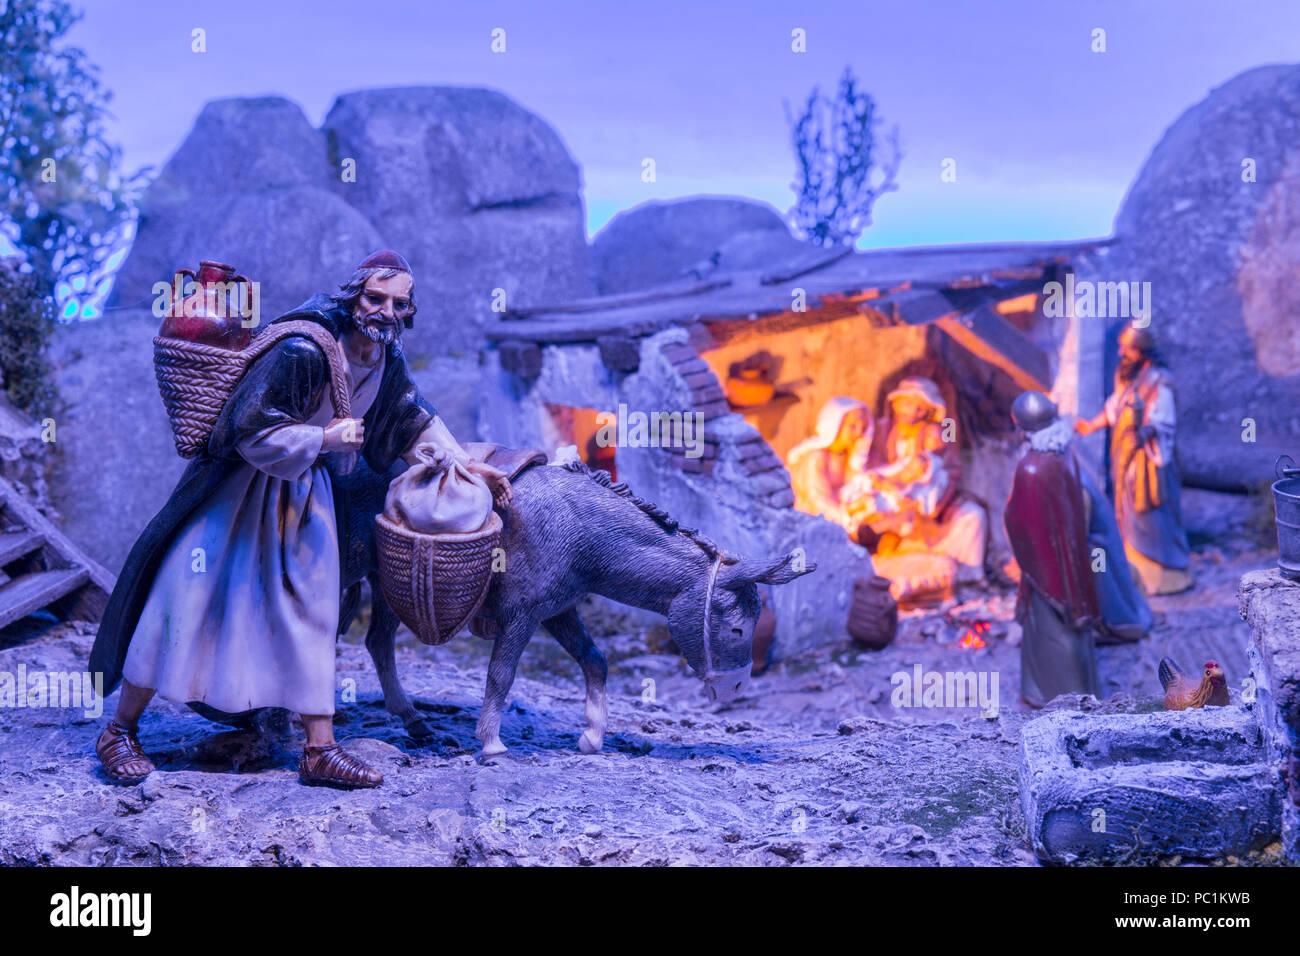 Badajoz, Spain - December 2017: Christmas Nativity scene. Diorama built by Local Association of Friends of Cribs of Badajoz - Stock Image